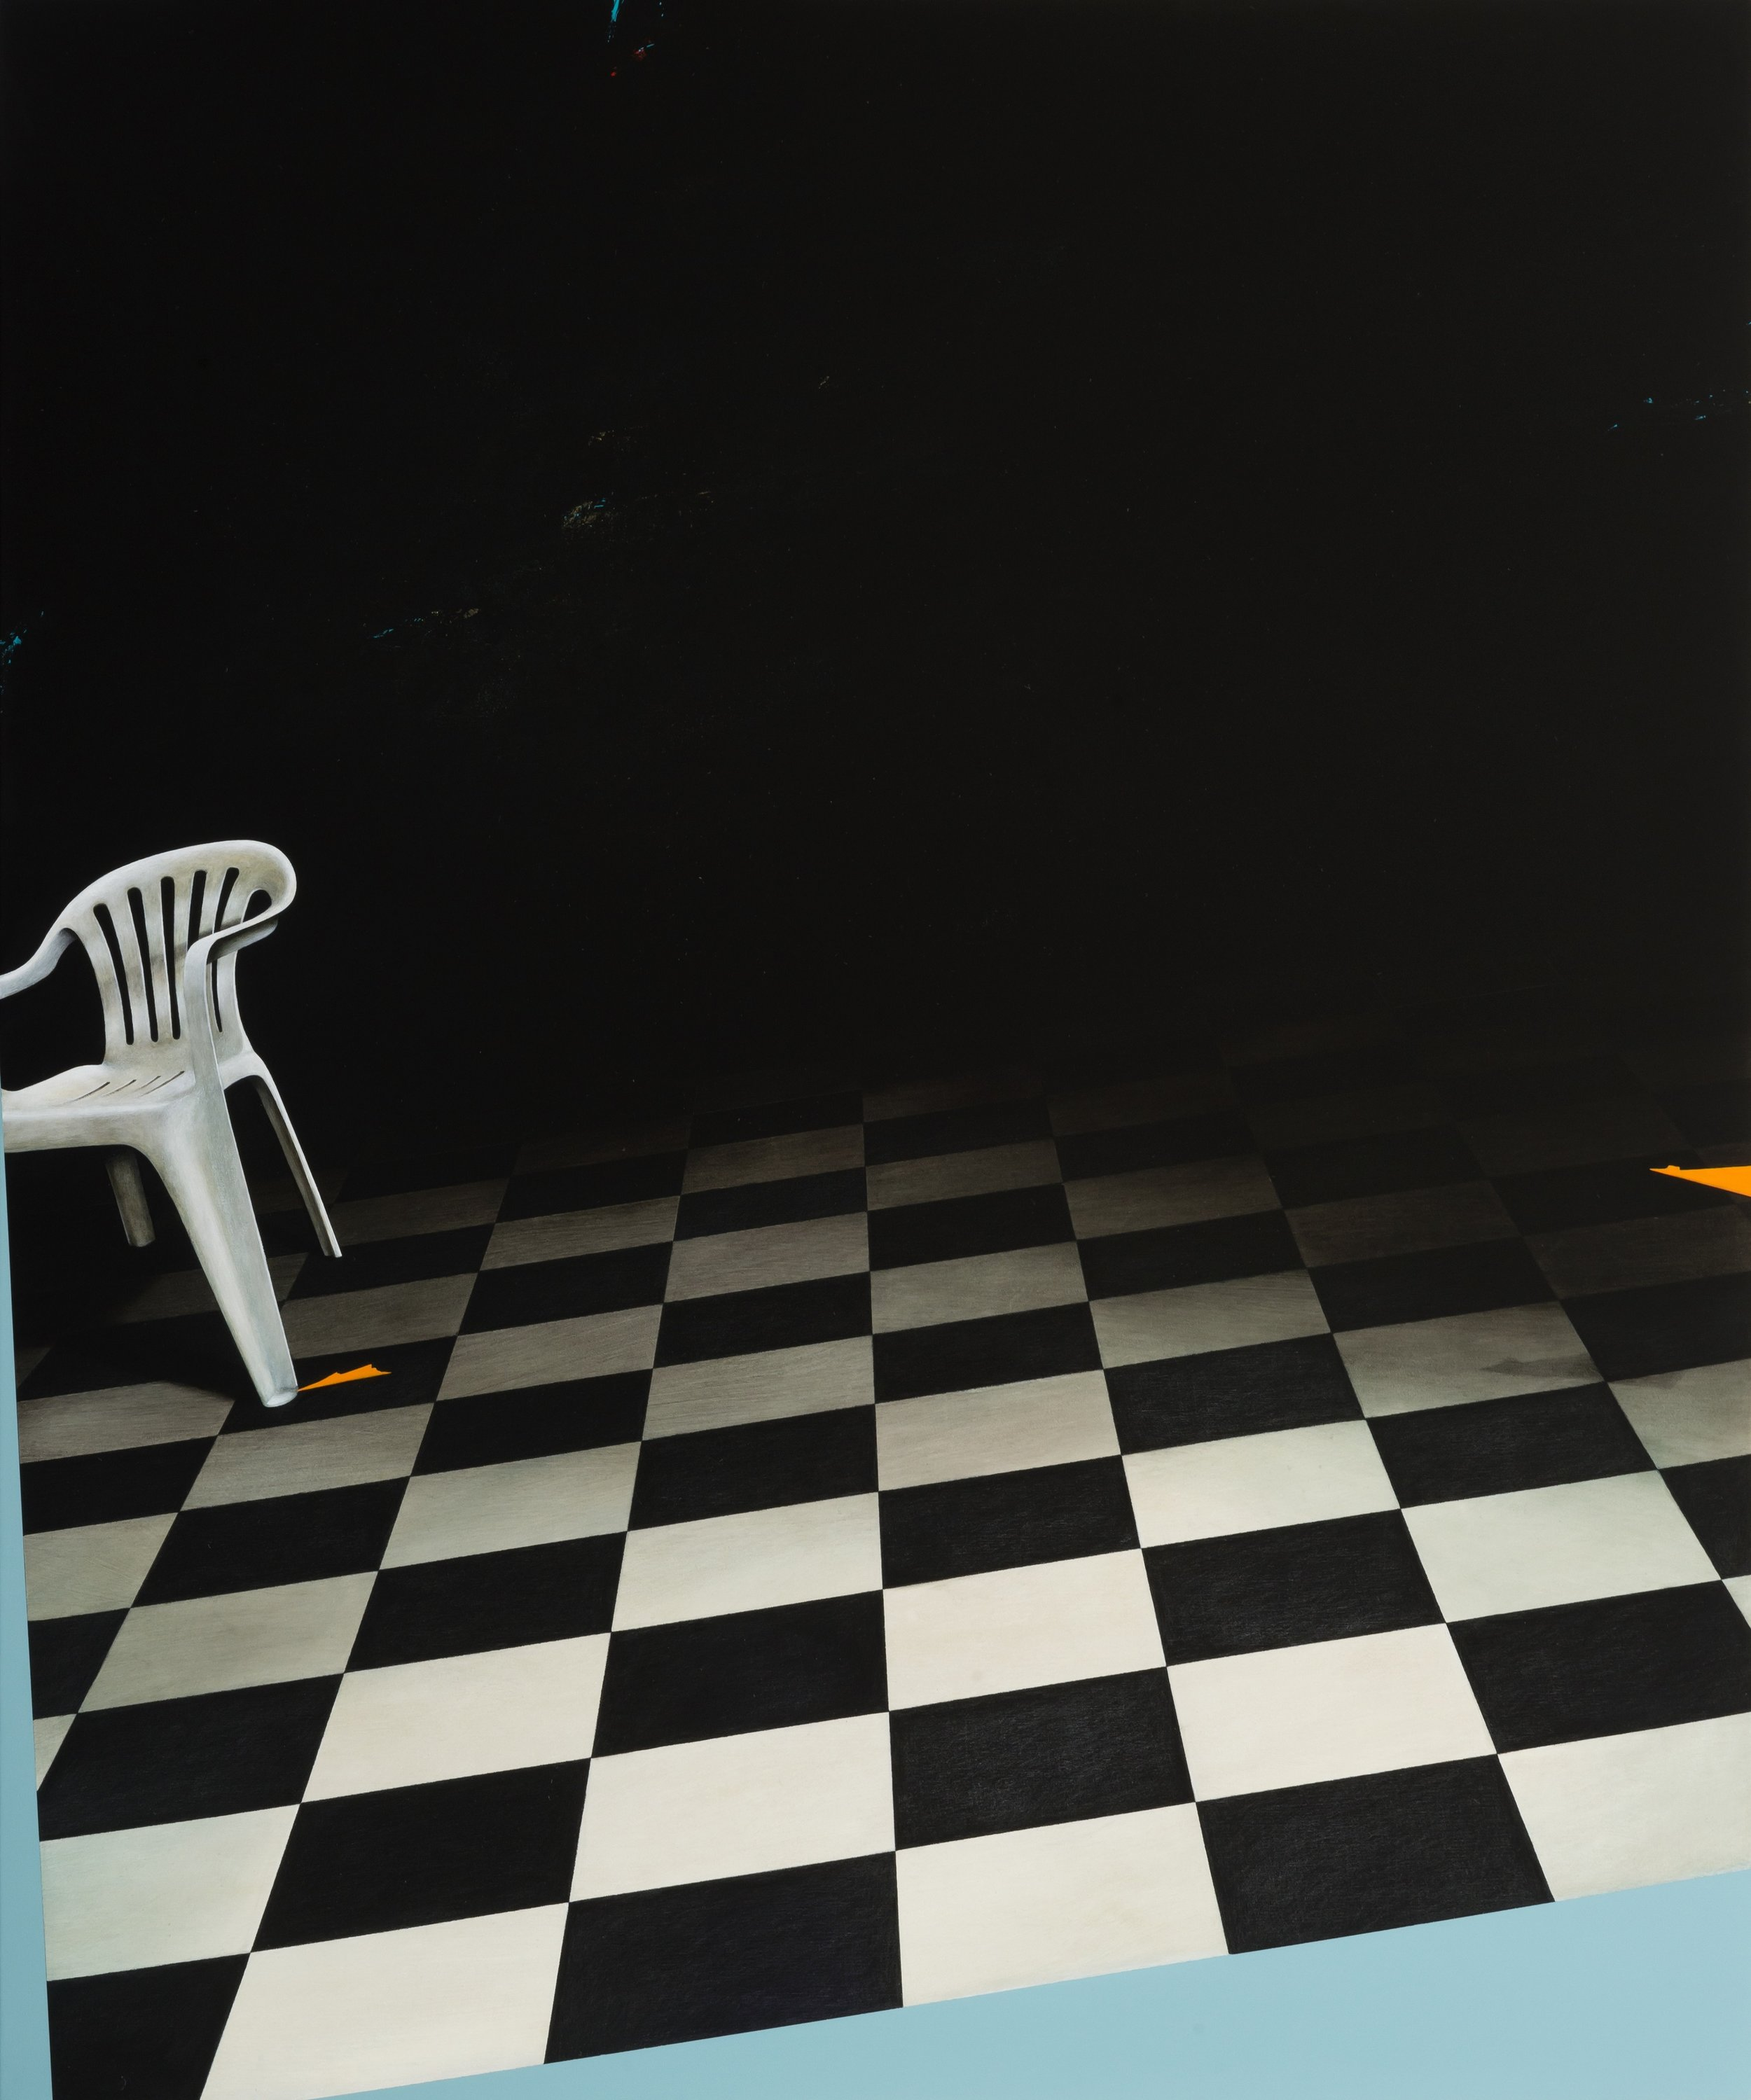 Jarek Wojcik, Sliding Room , 2015, acrylic on linen, 122 x 102cm